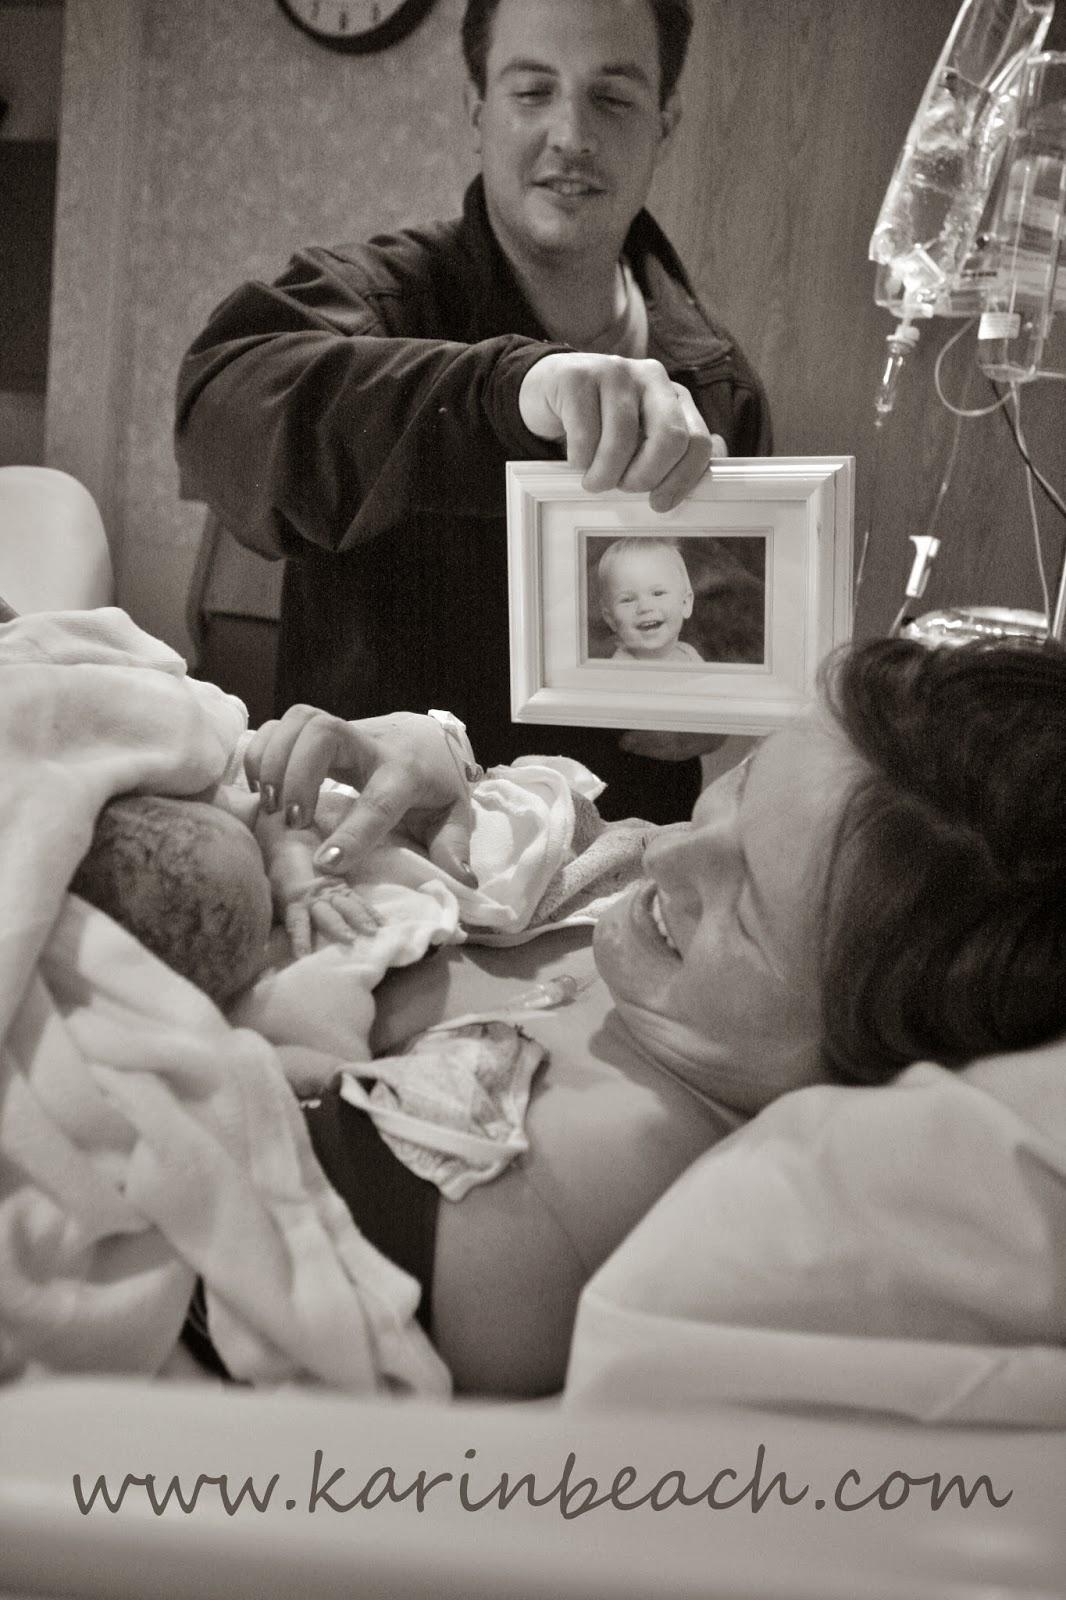 Northern NJ Birth doula